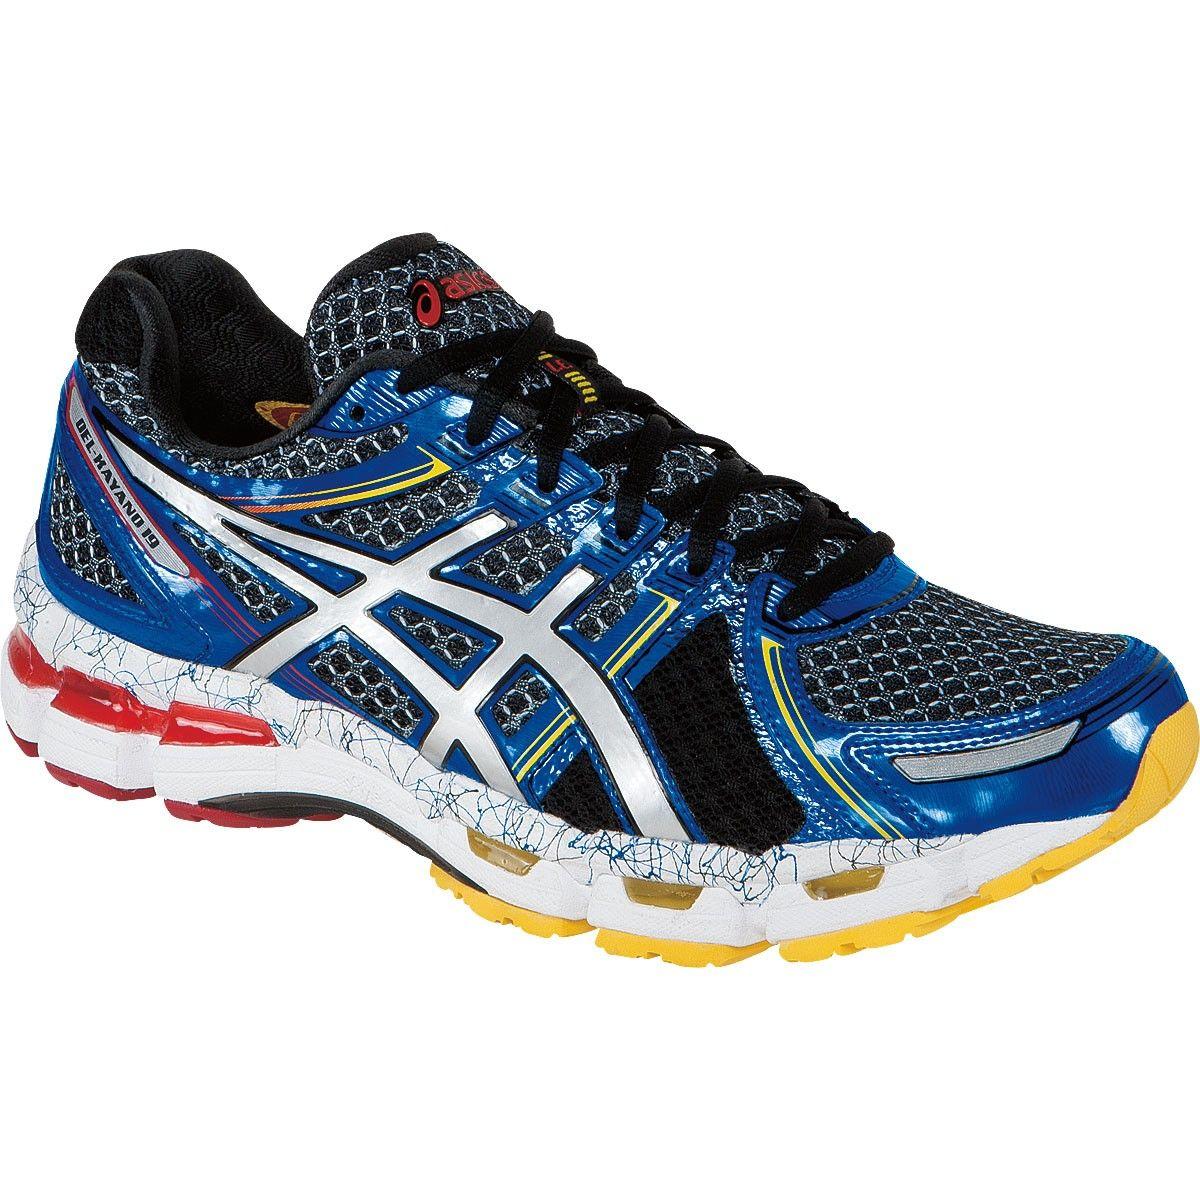 Asics Gel Kayano 19 Men S Running Shoes Running Shoes For Men